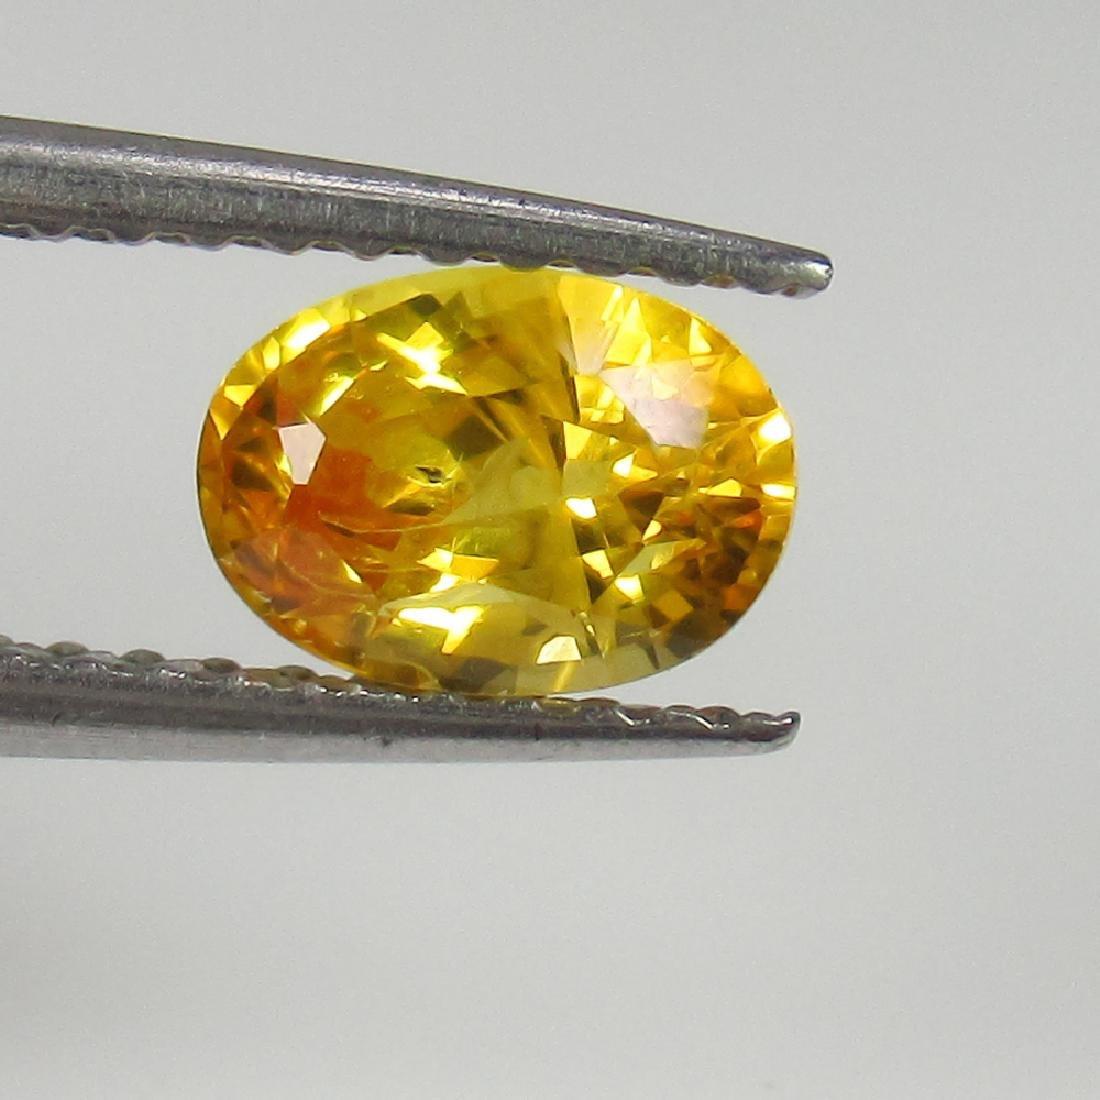 1.03 Ct Genuine Ceylon Yellow Sapphire Nice Oval Cut